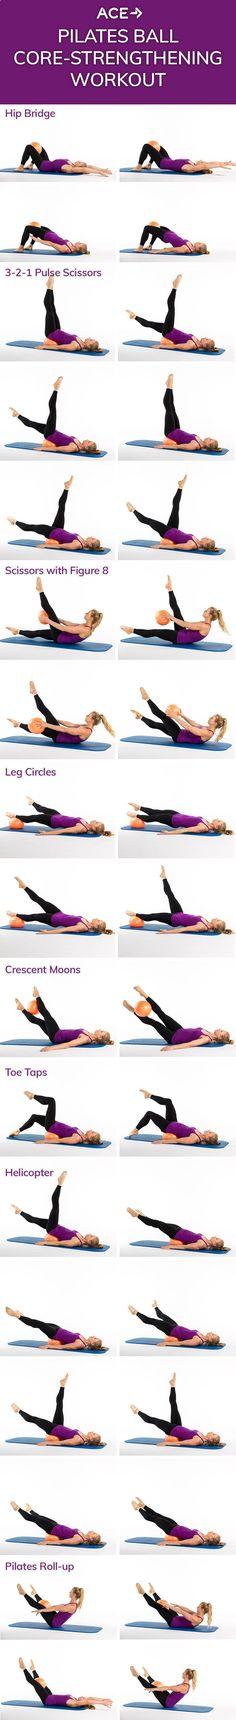 The Pilates Ball Core-Strengthening Workout. Contessa Siders · yoga e44cf5b76cc8